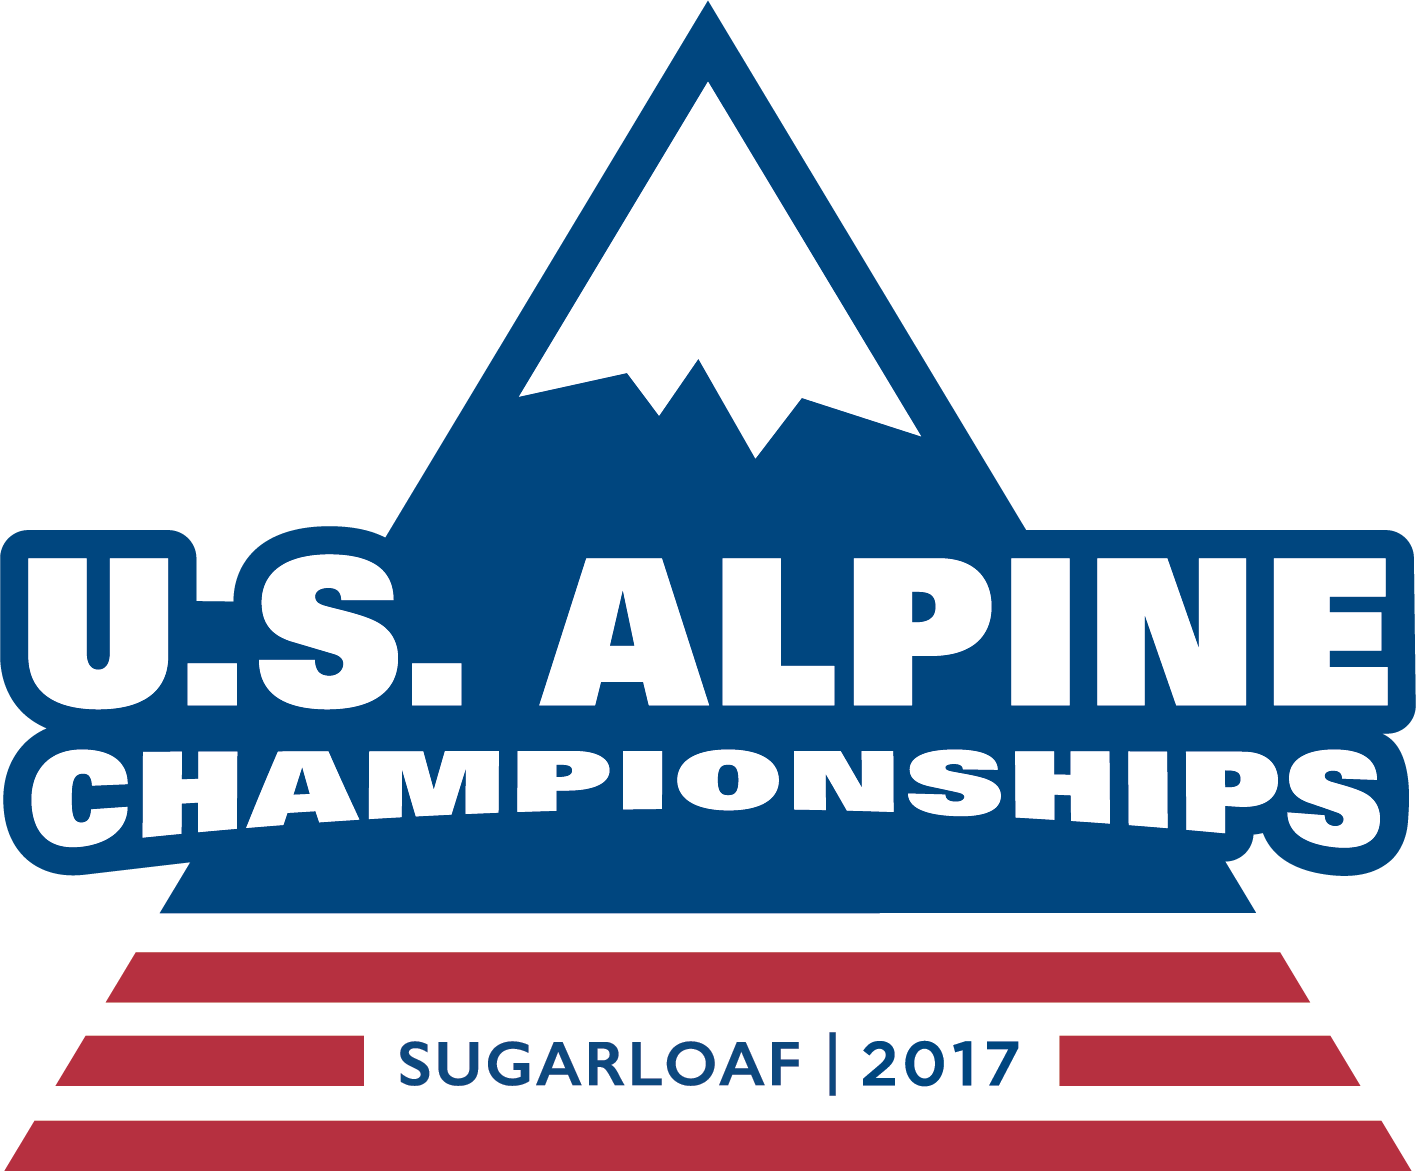 Sugarloaf US Alpine Championships 2017 Logo